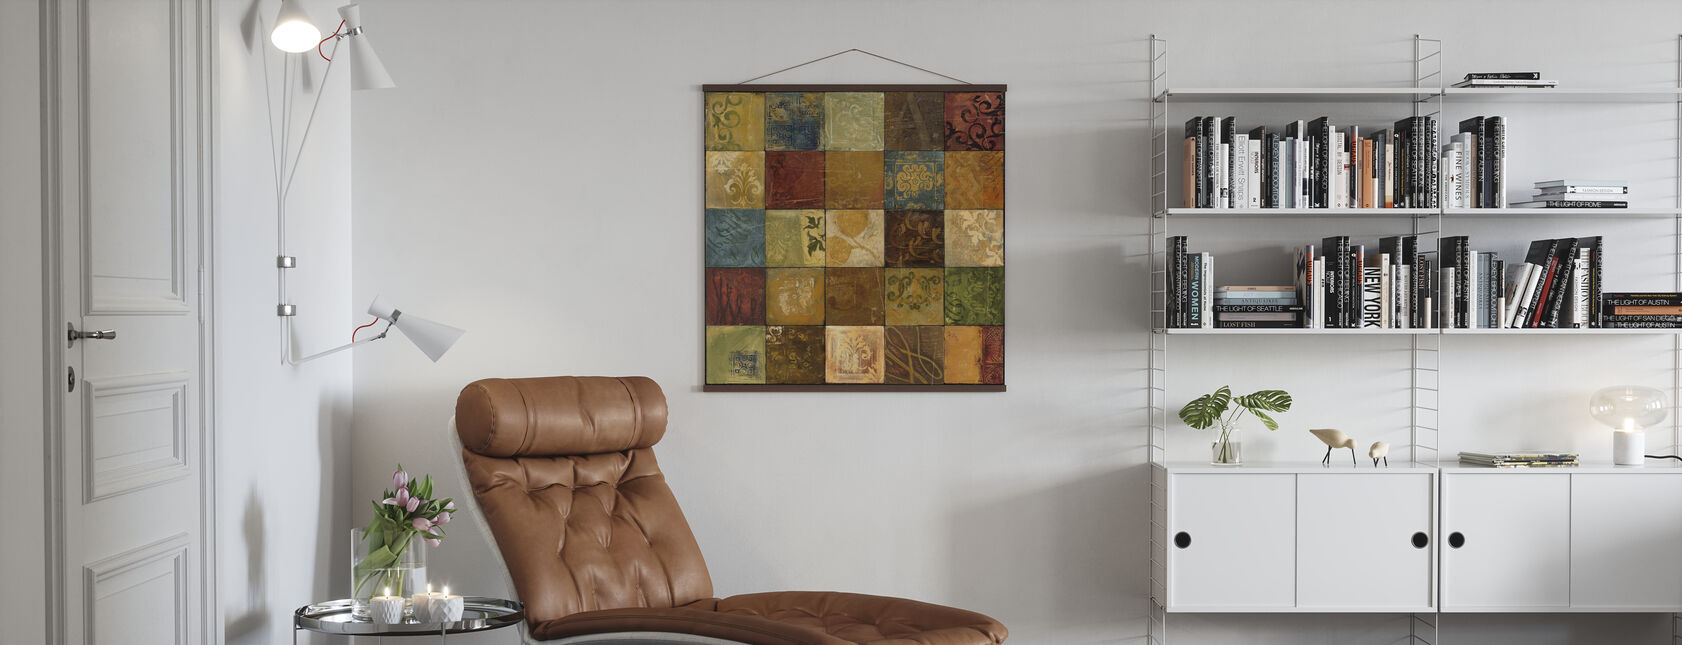 Avery Tillmon - Serendipity - Wag - Poster - Living Room